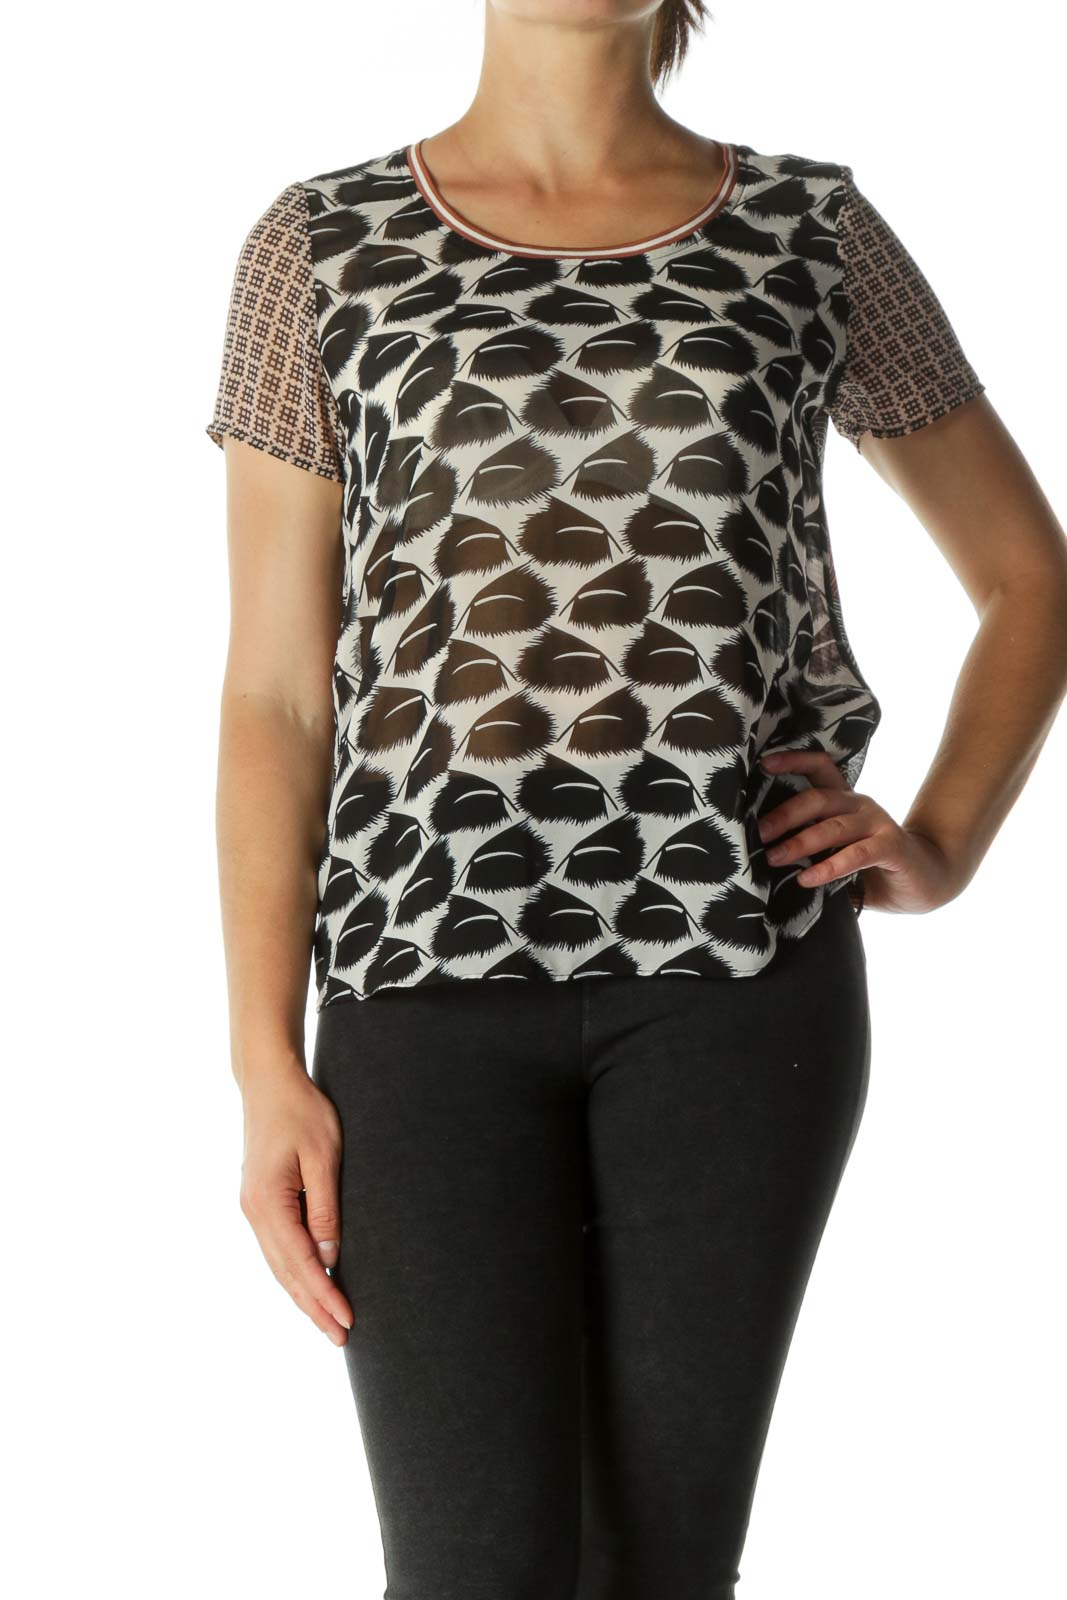 Black & Pink Sheer Contrast Pattern T-shirt Front